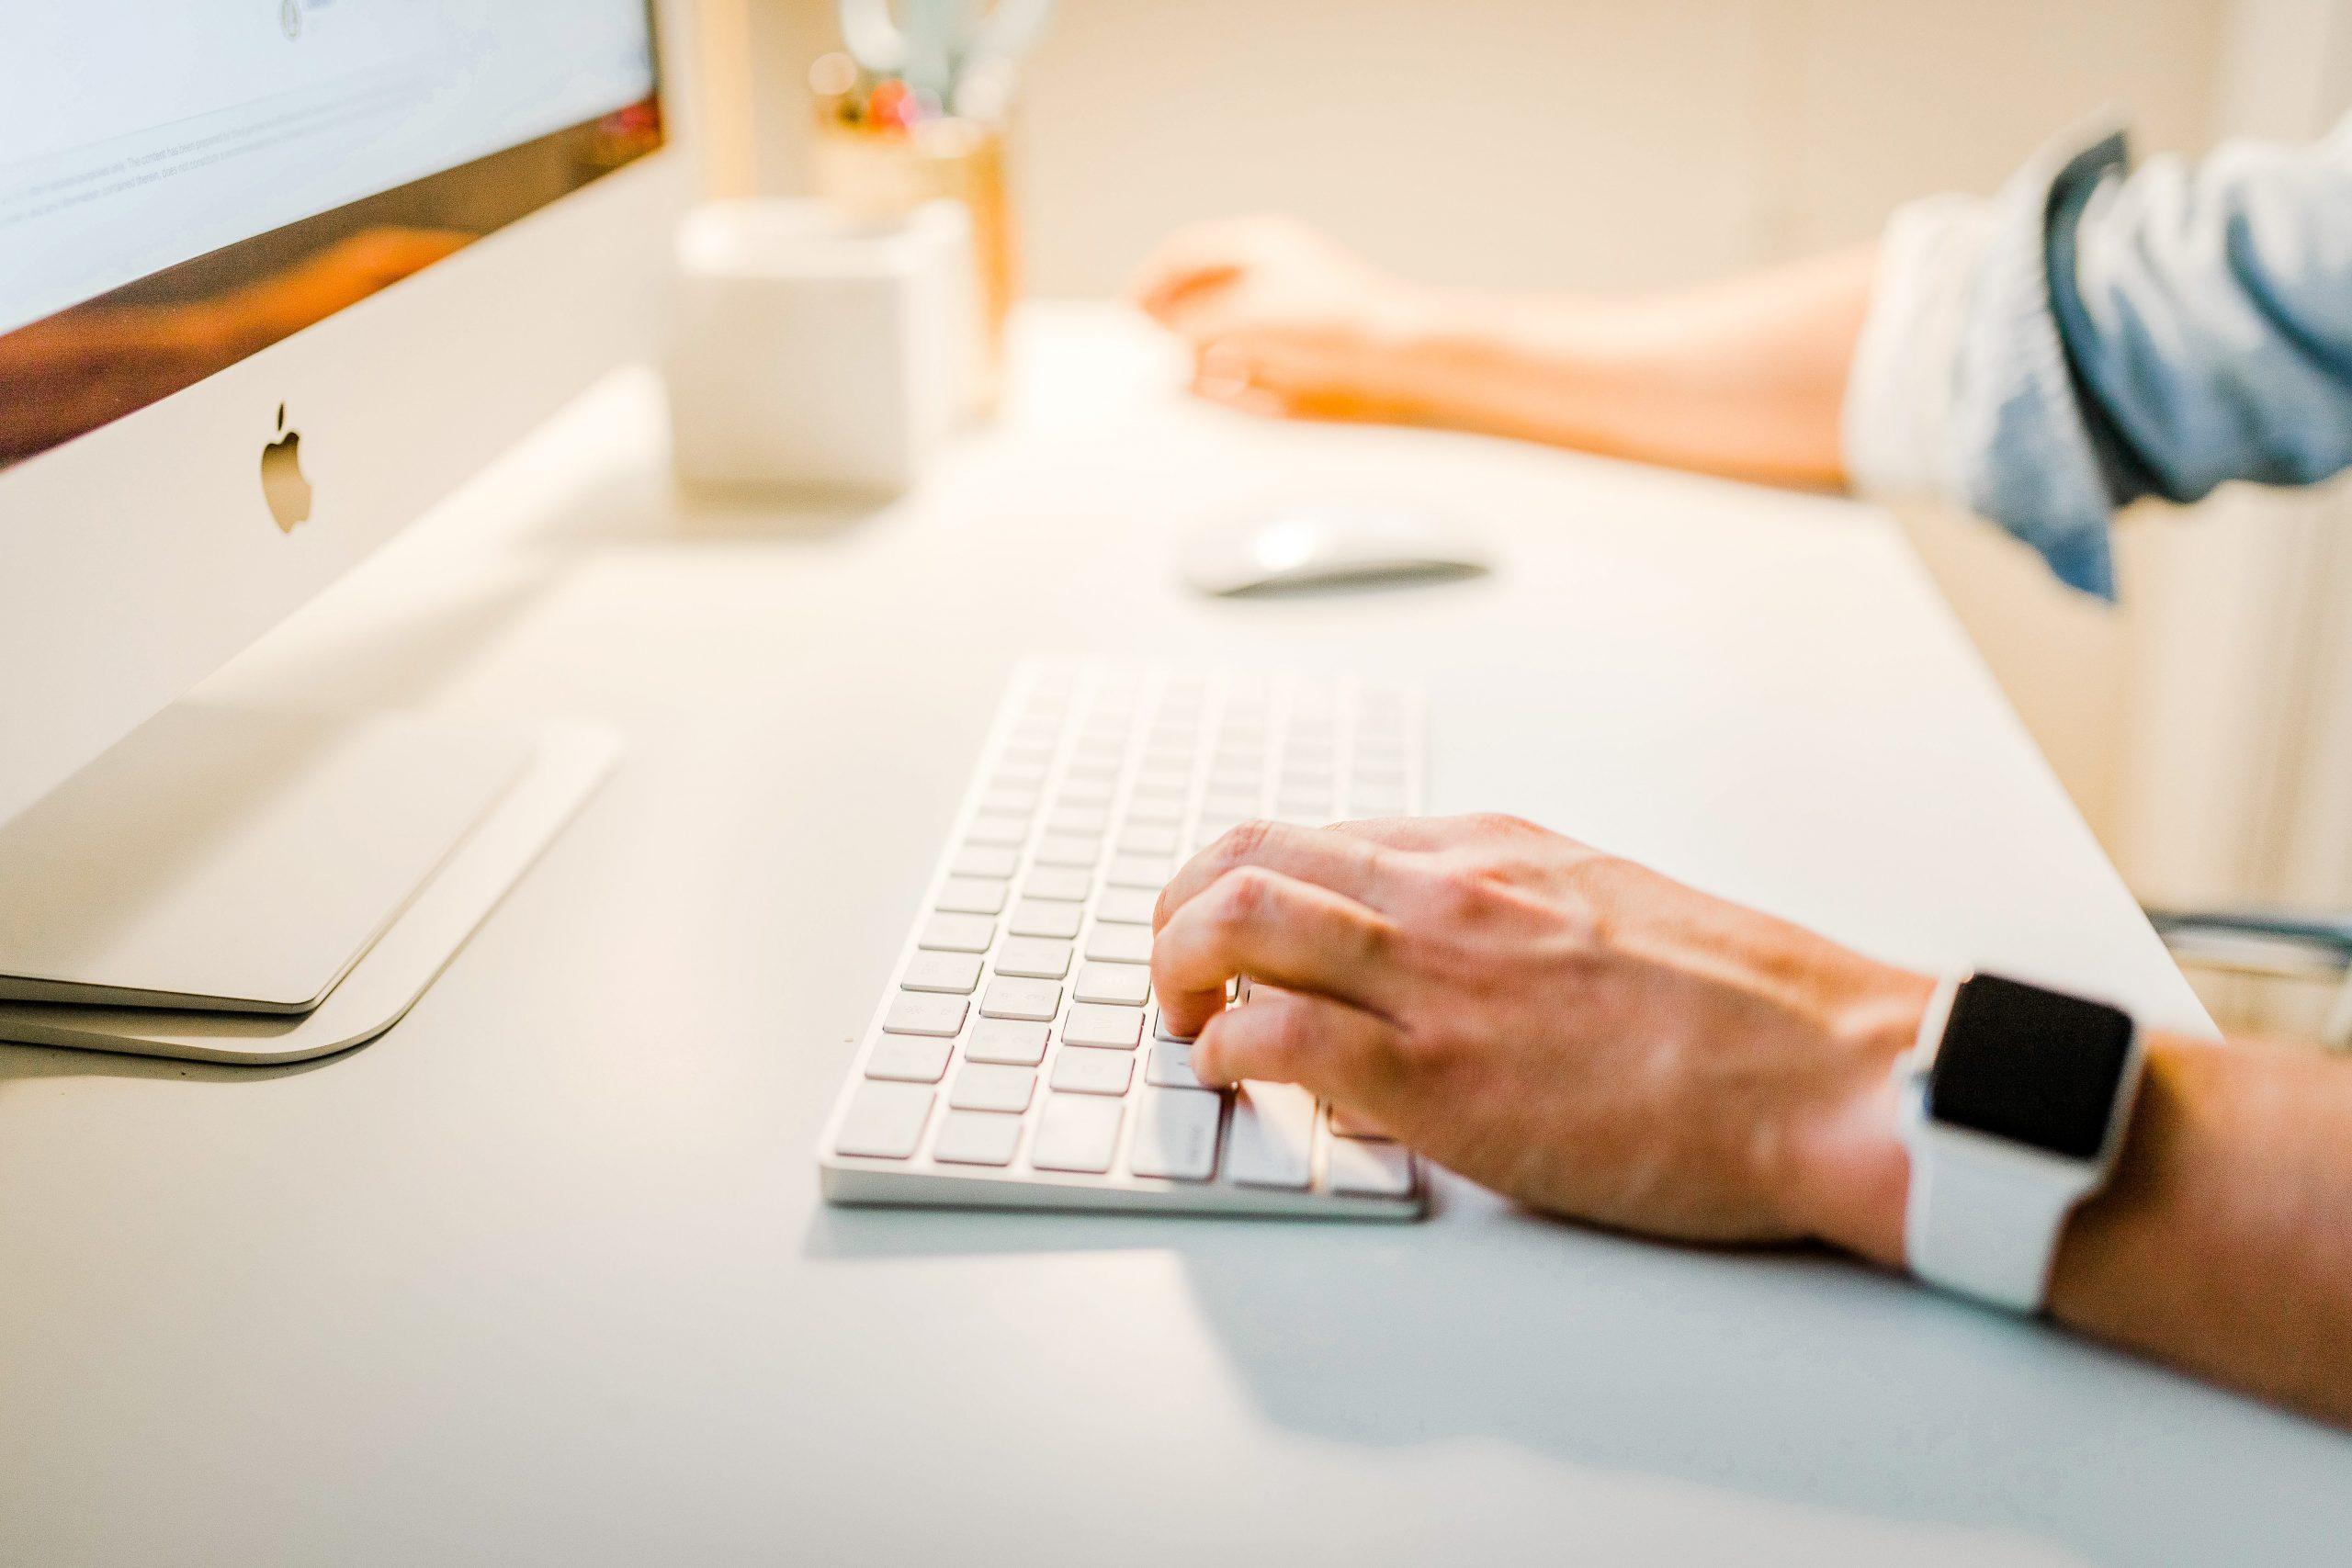 Enhance customer-business relationship through chatbot